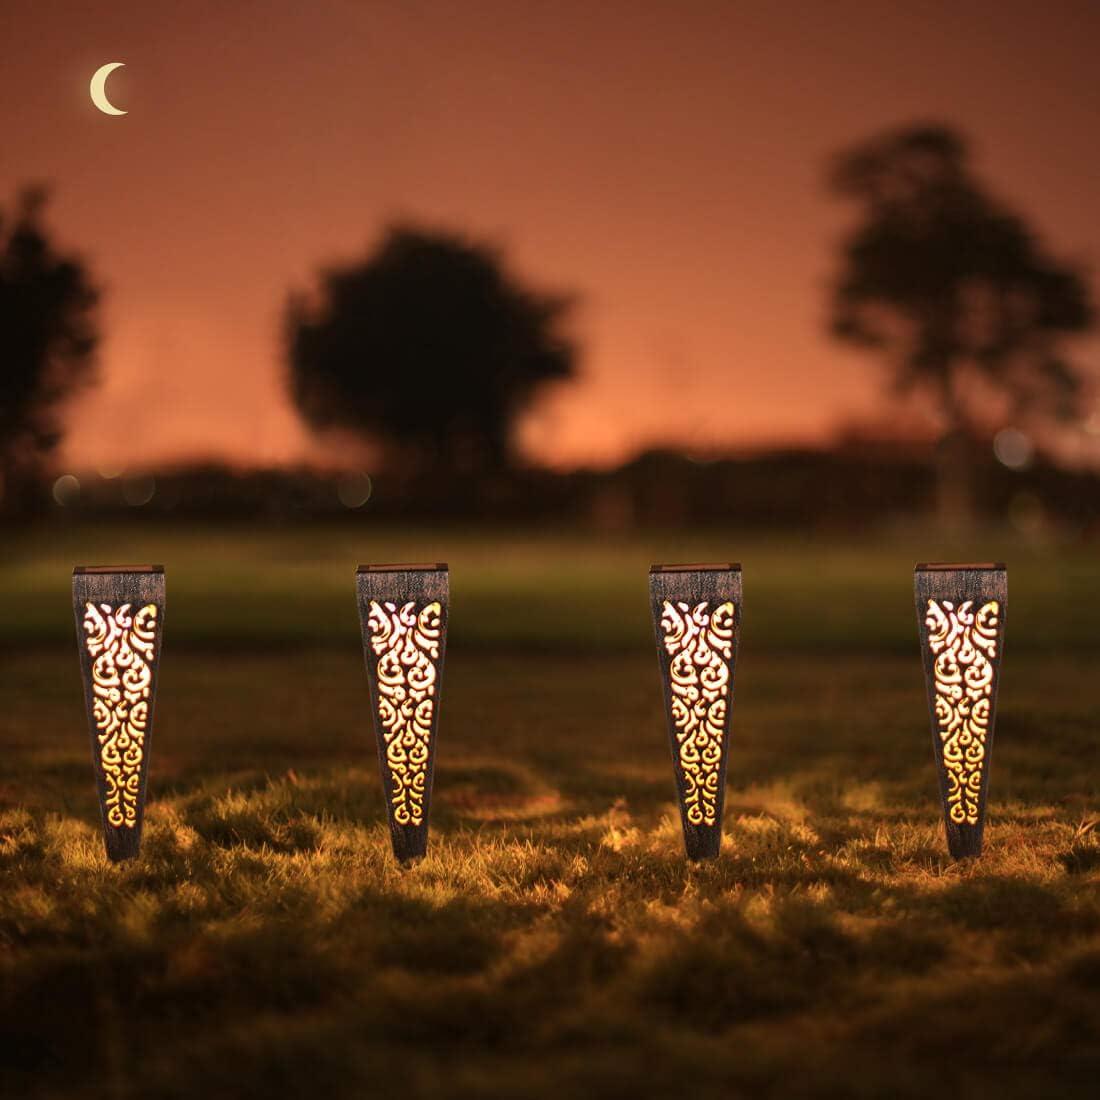 6Pcs Solar Lights Outdoor Decorative Pathway Garden Stakes Waterproof LED Pathway Lighting for Patio, Walkway, Lawn Decorations (Bronze)